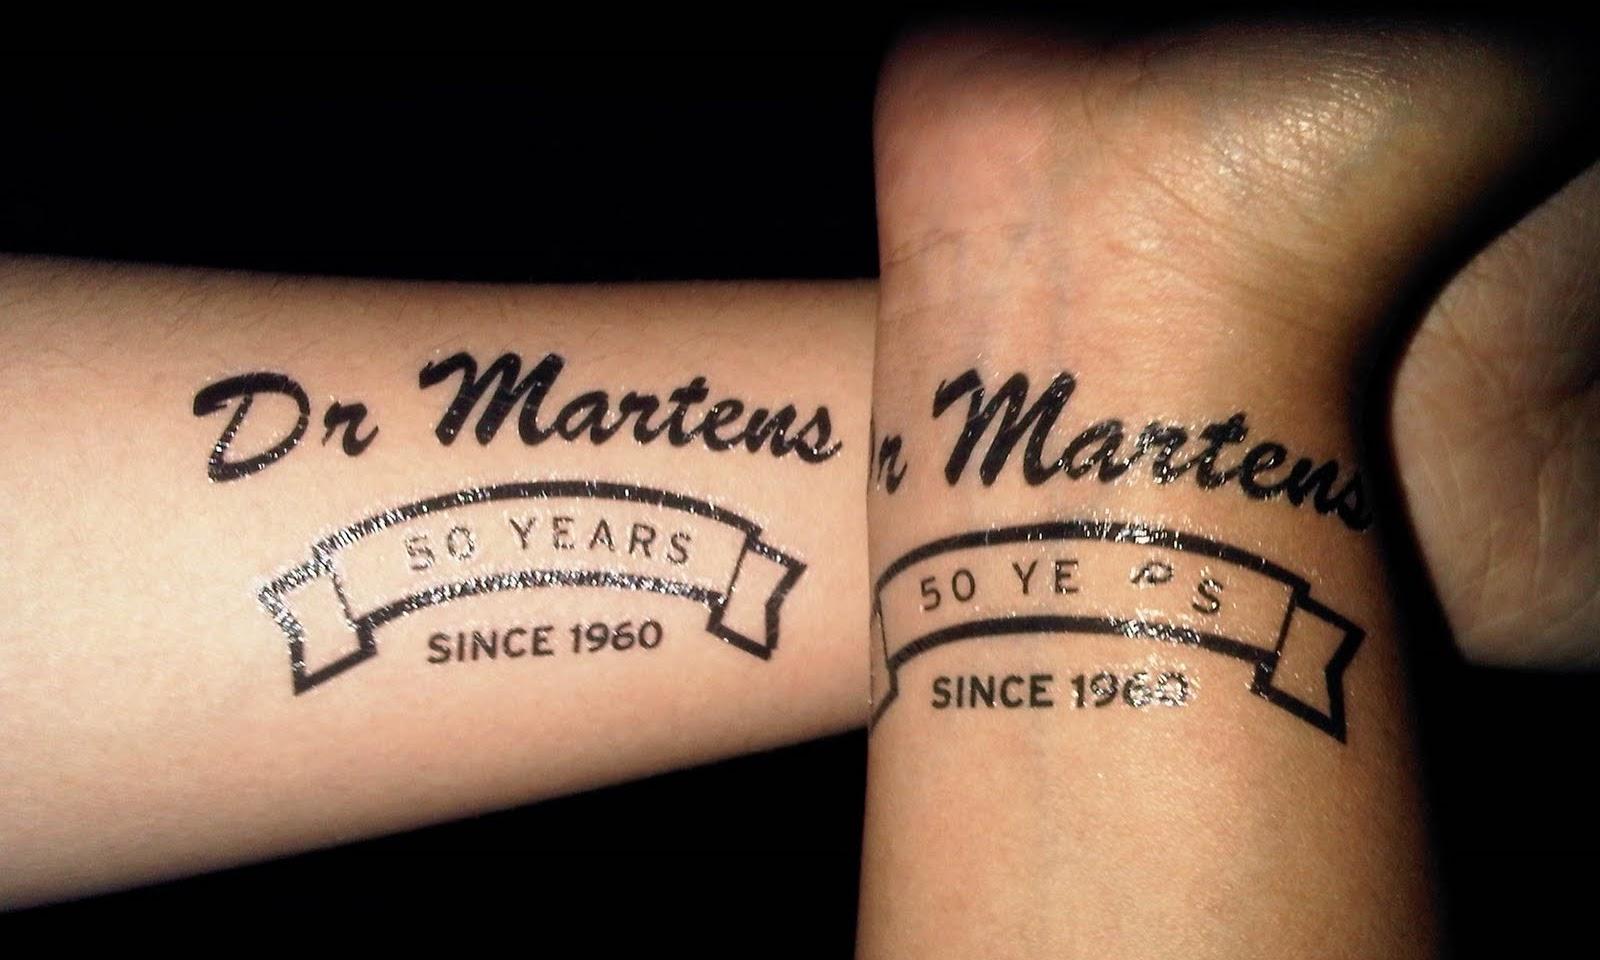 Doctor Marten's 50th anniversary